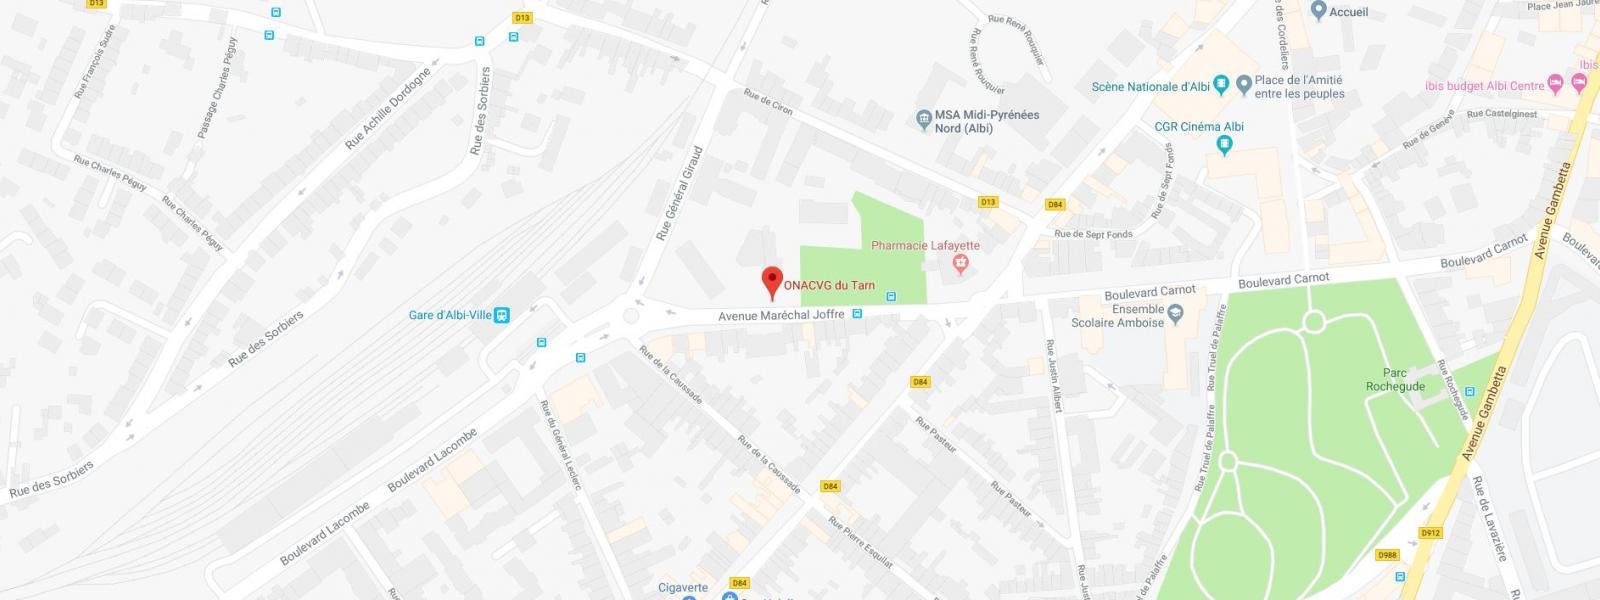 Carte Service Departemental De Lonacvg Du Tarn